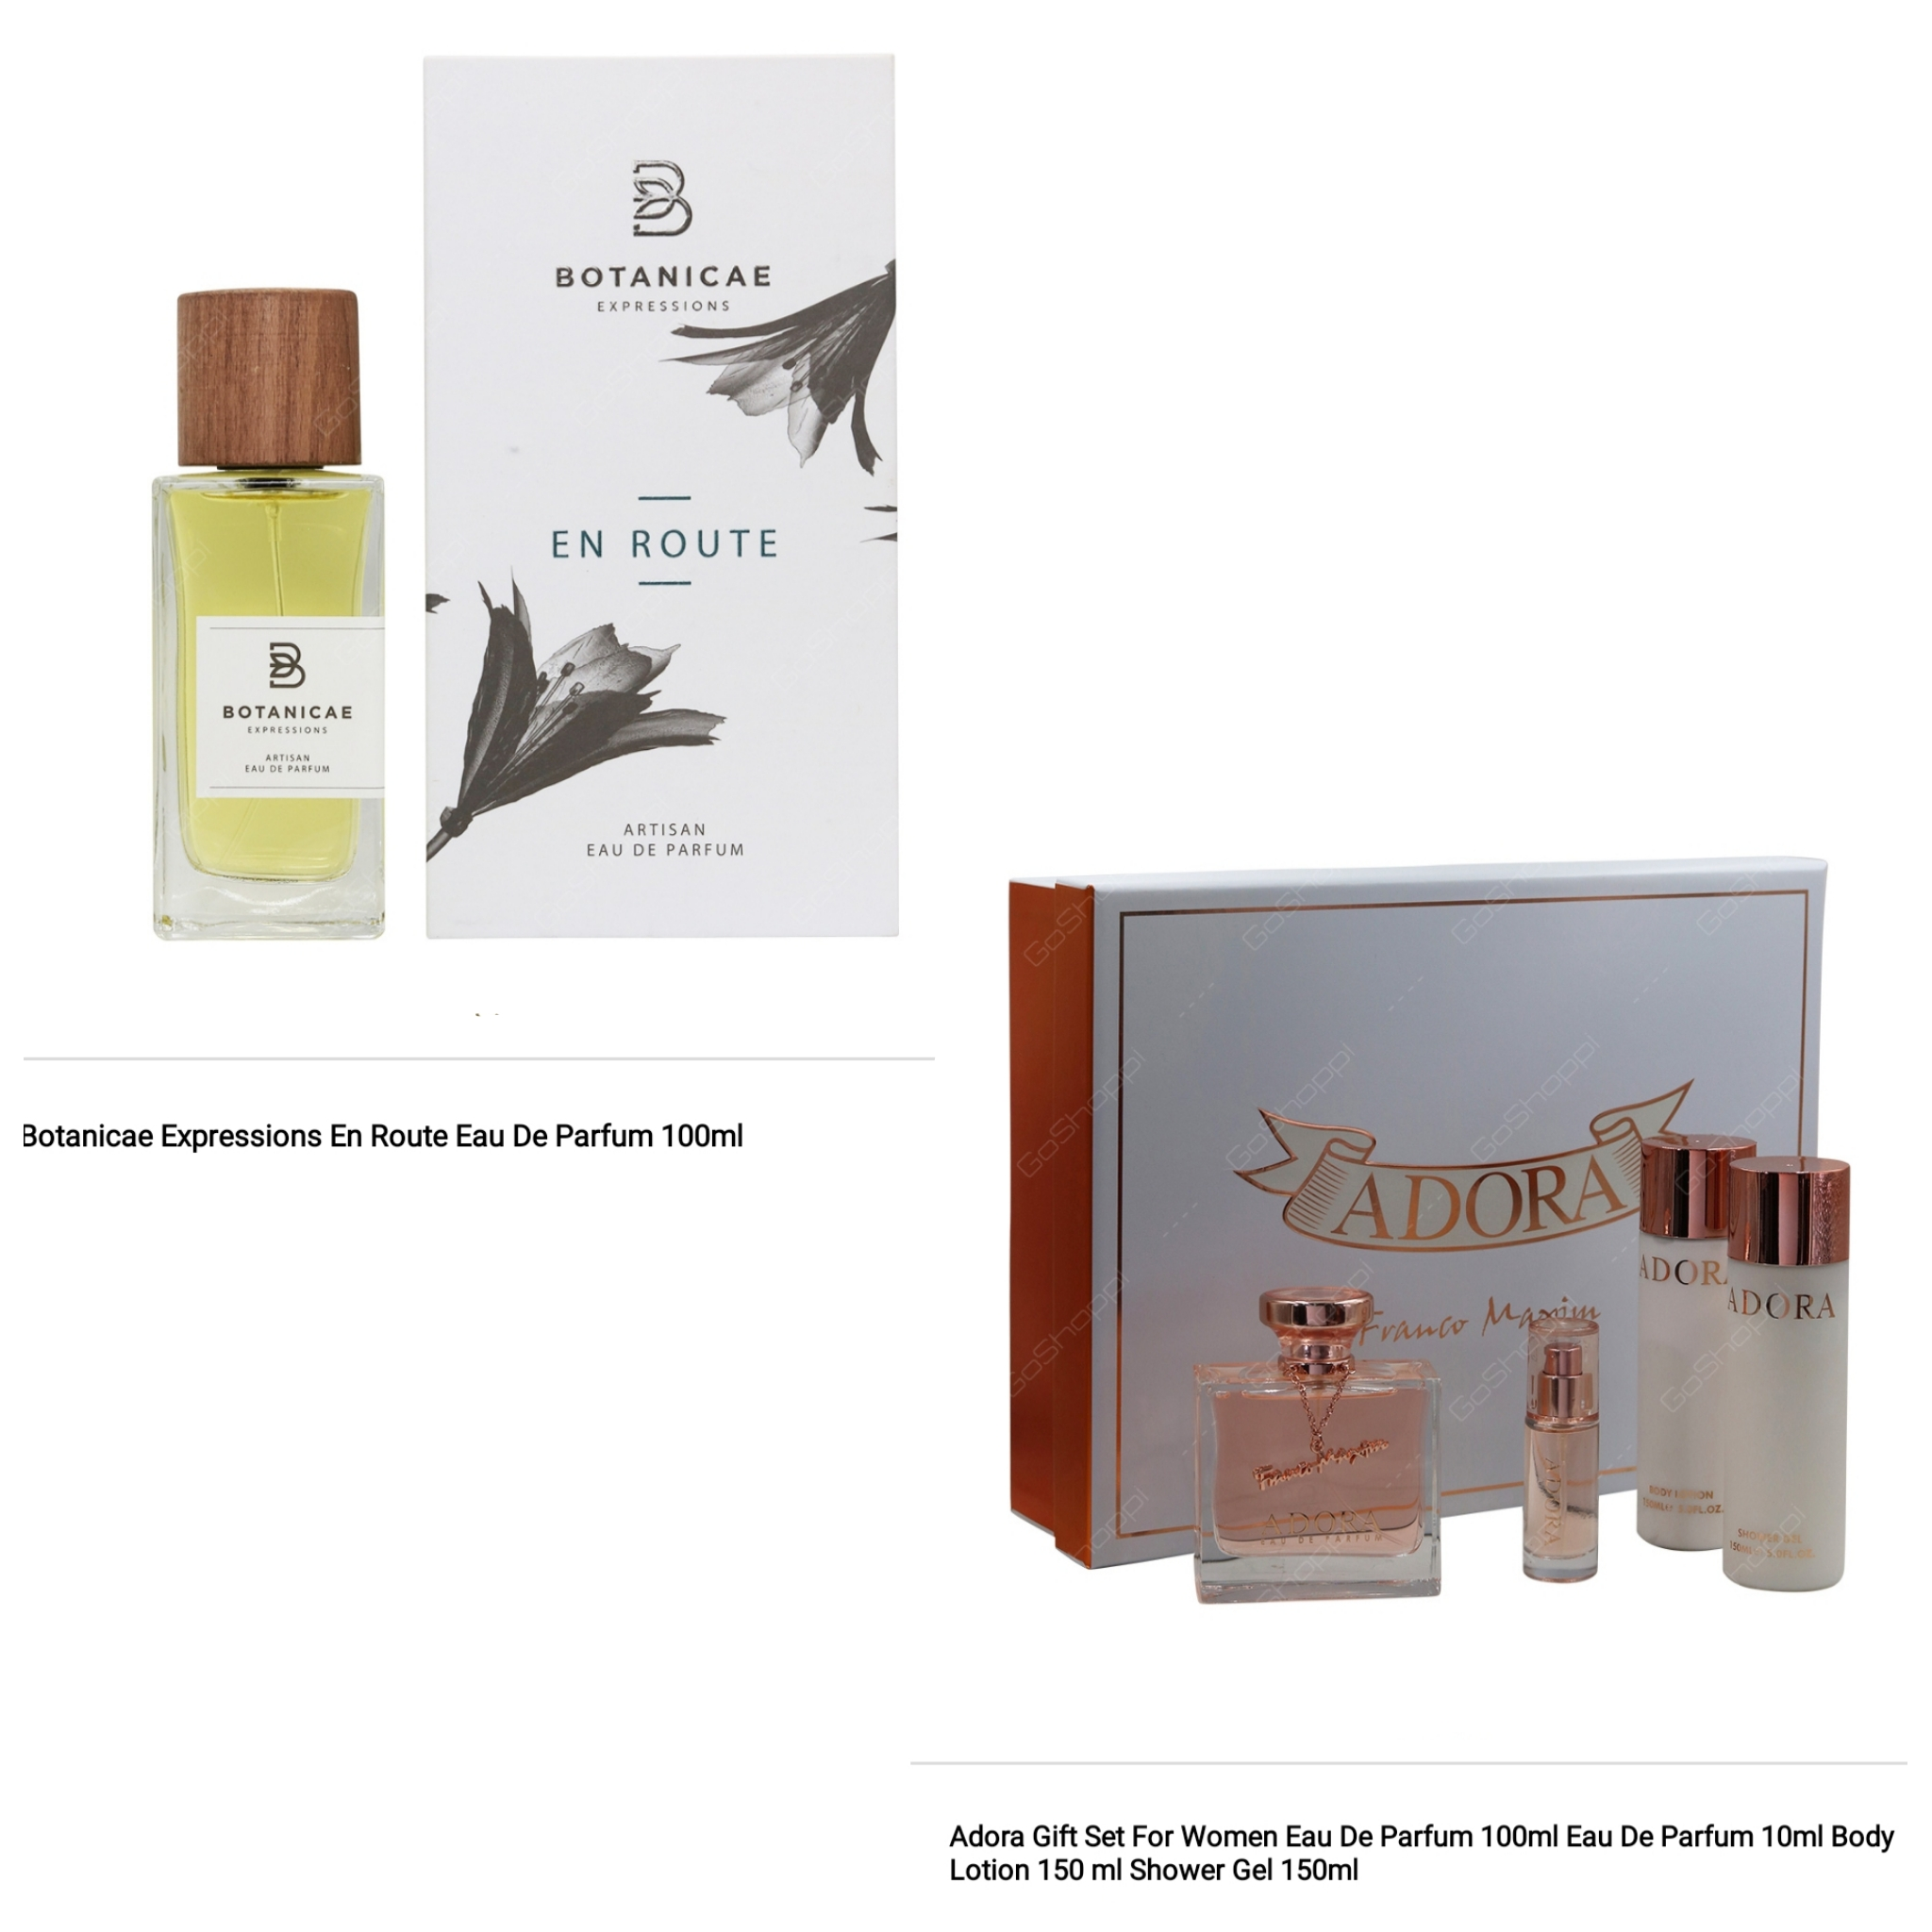 Botanicae En Route 100ml and Adora 4 Pcs Gift sets Combo Offer